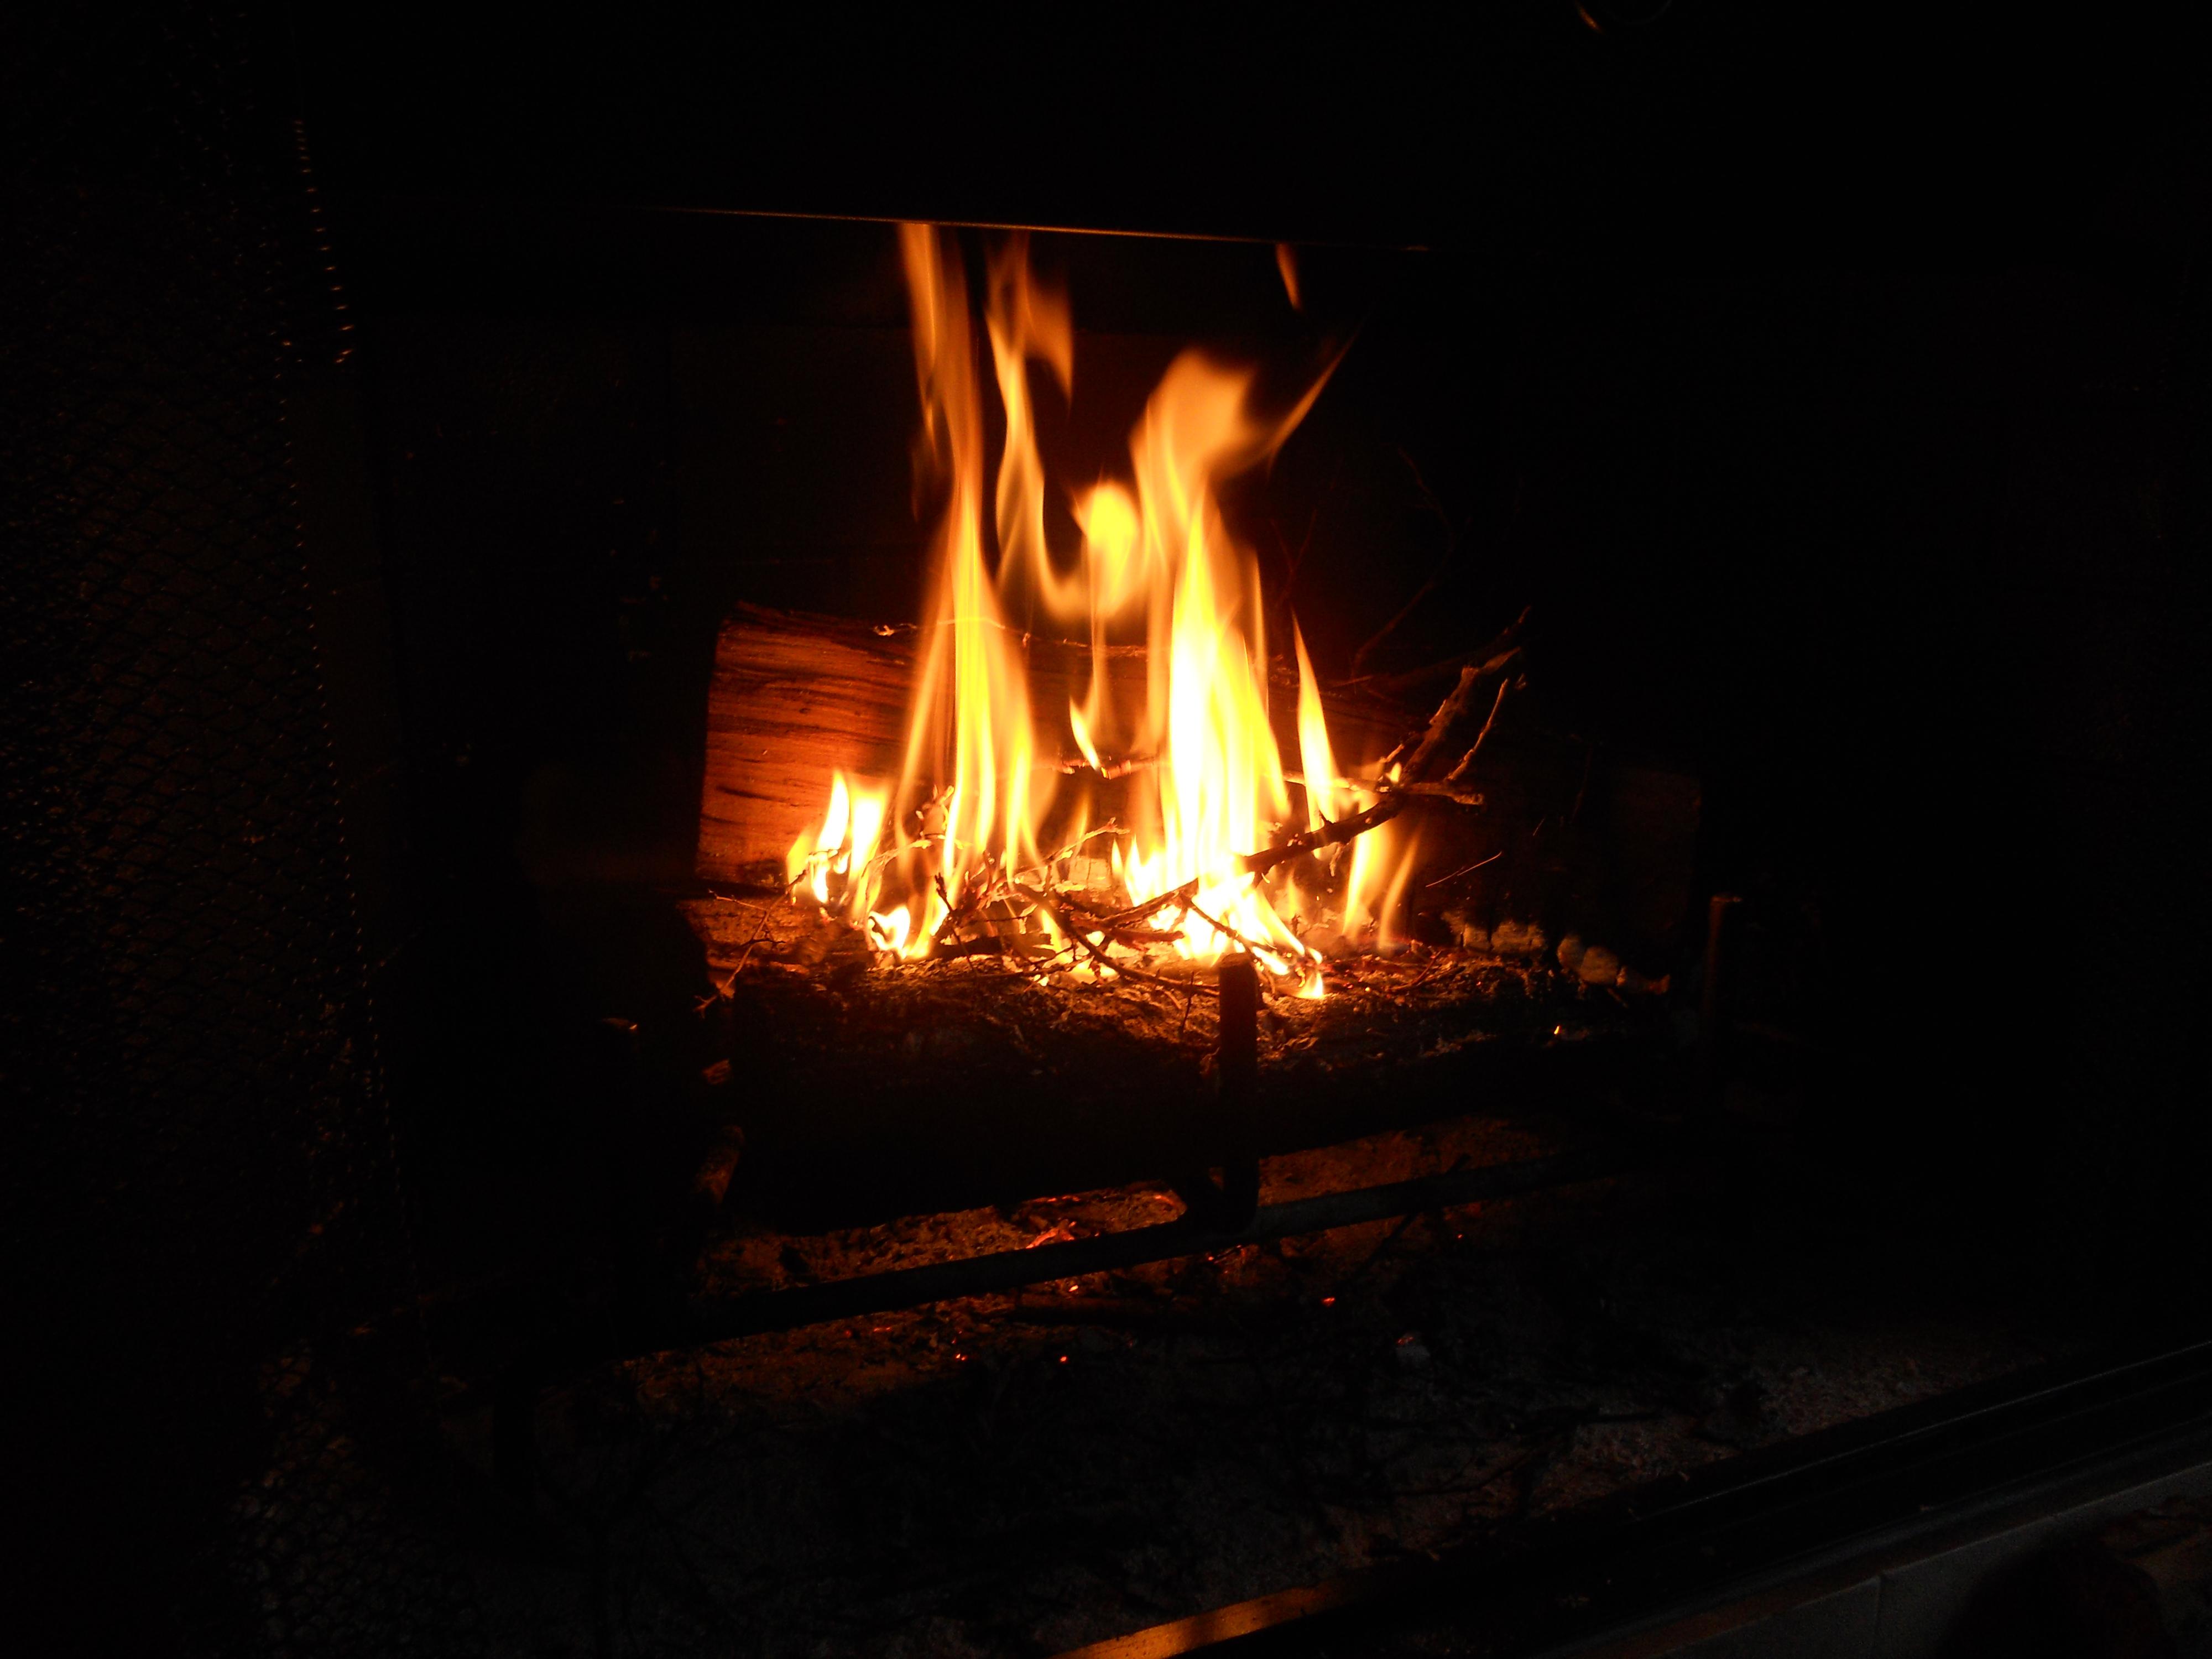 Woodsman Sarah, Or, I Learned to Build a Fire | A Wife Loved Like ...